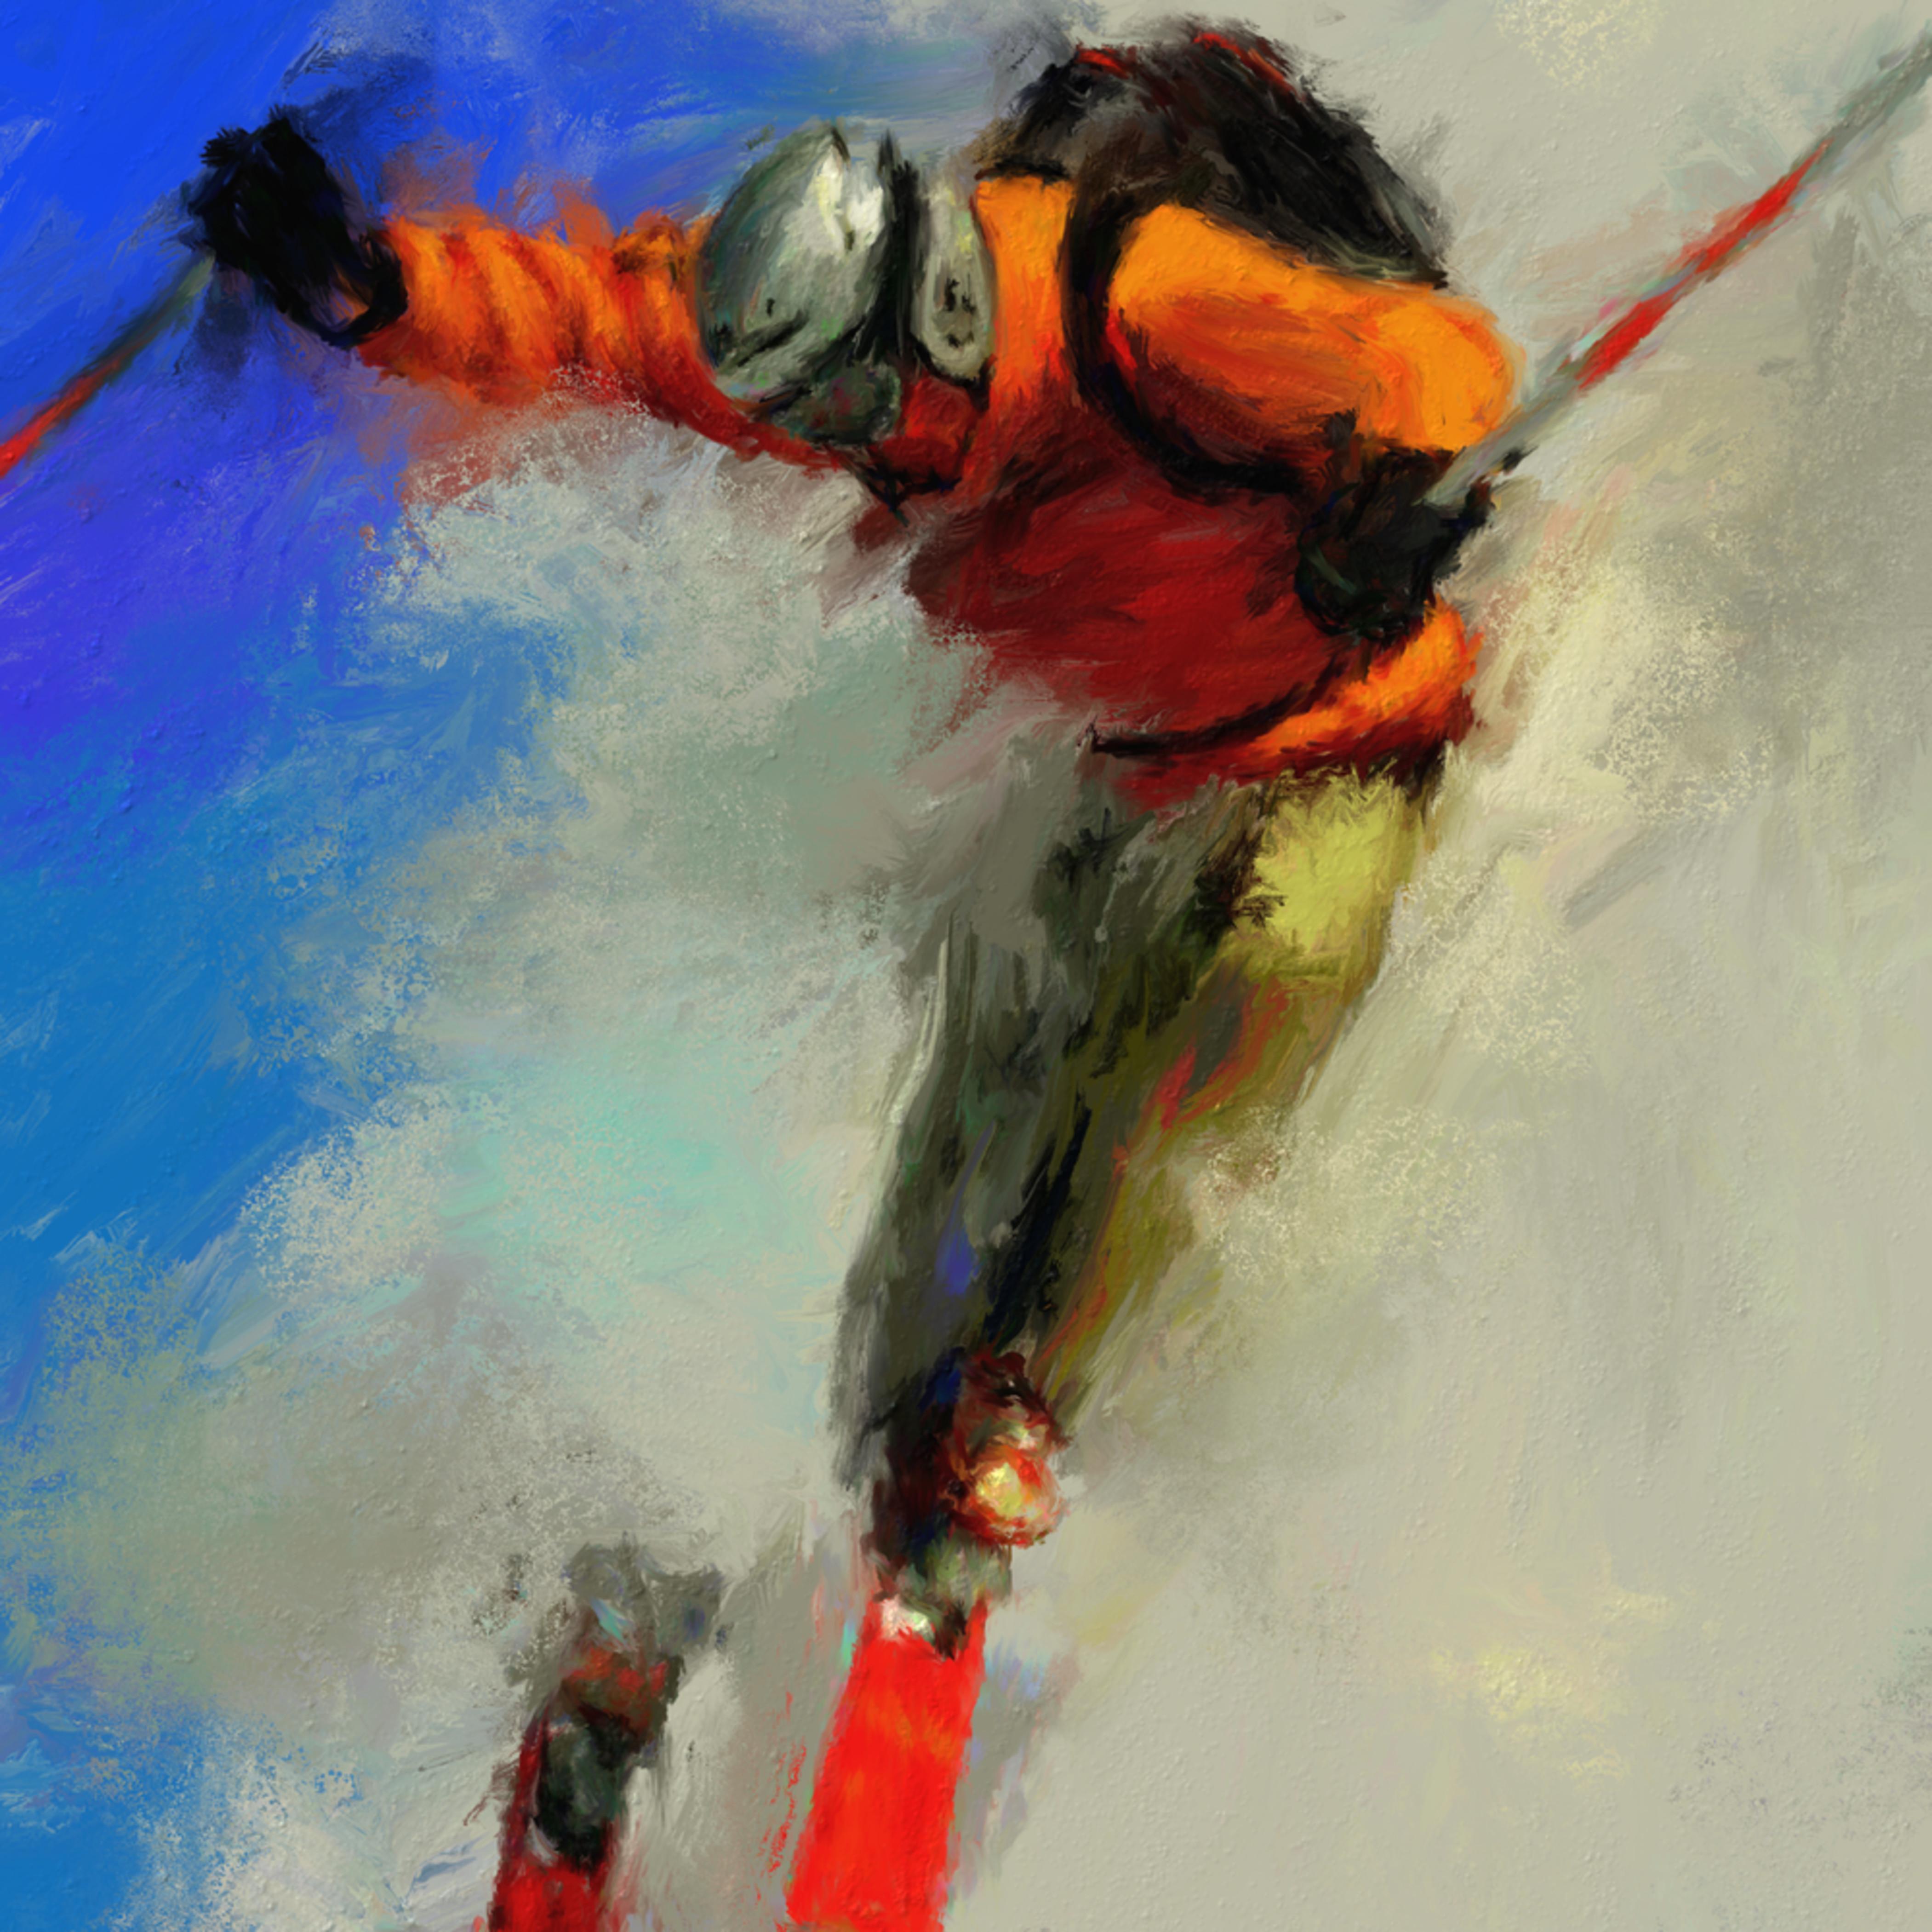 Extreme skiing rnflnh